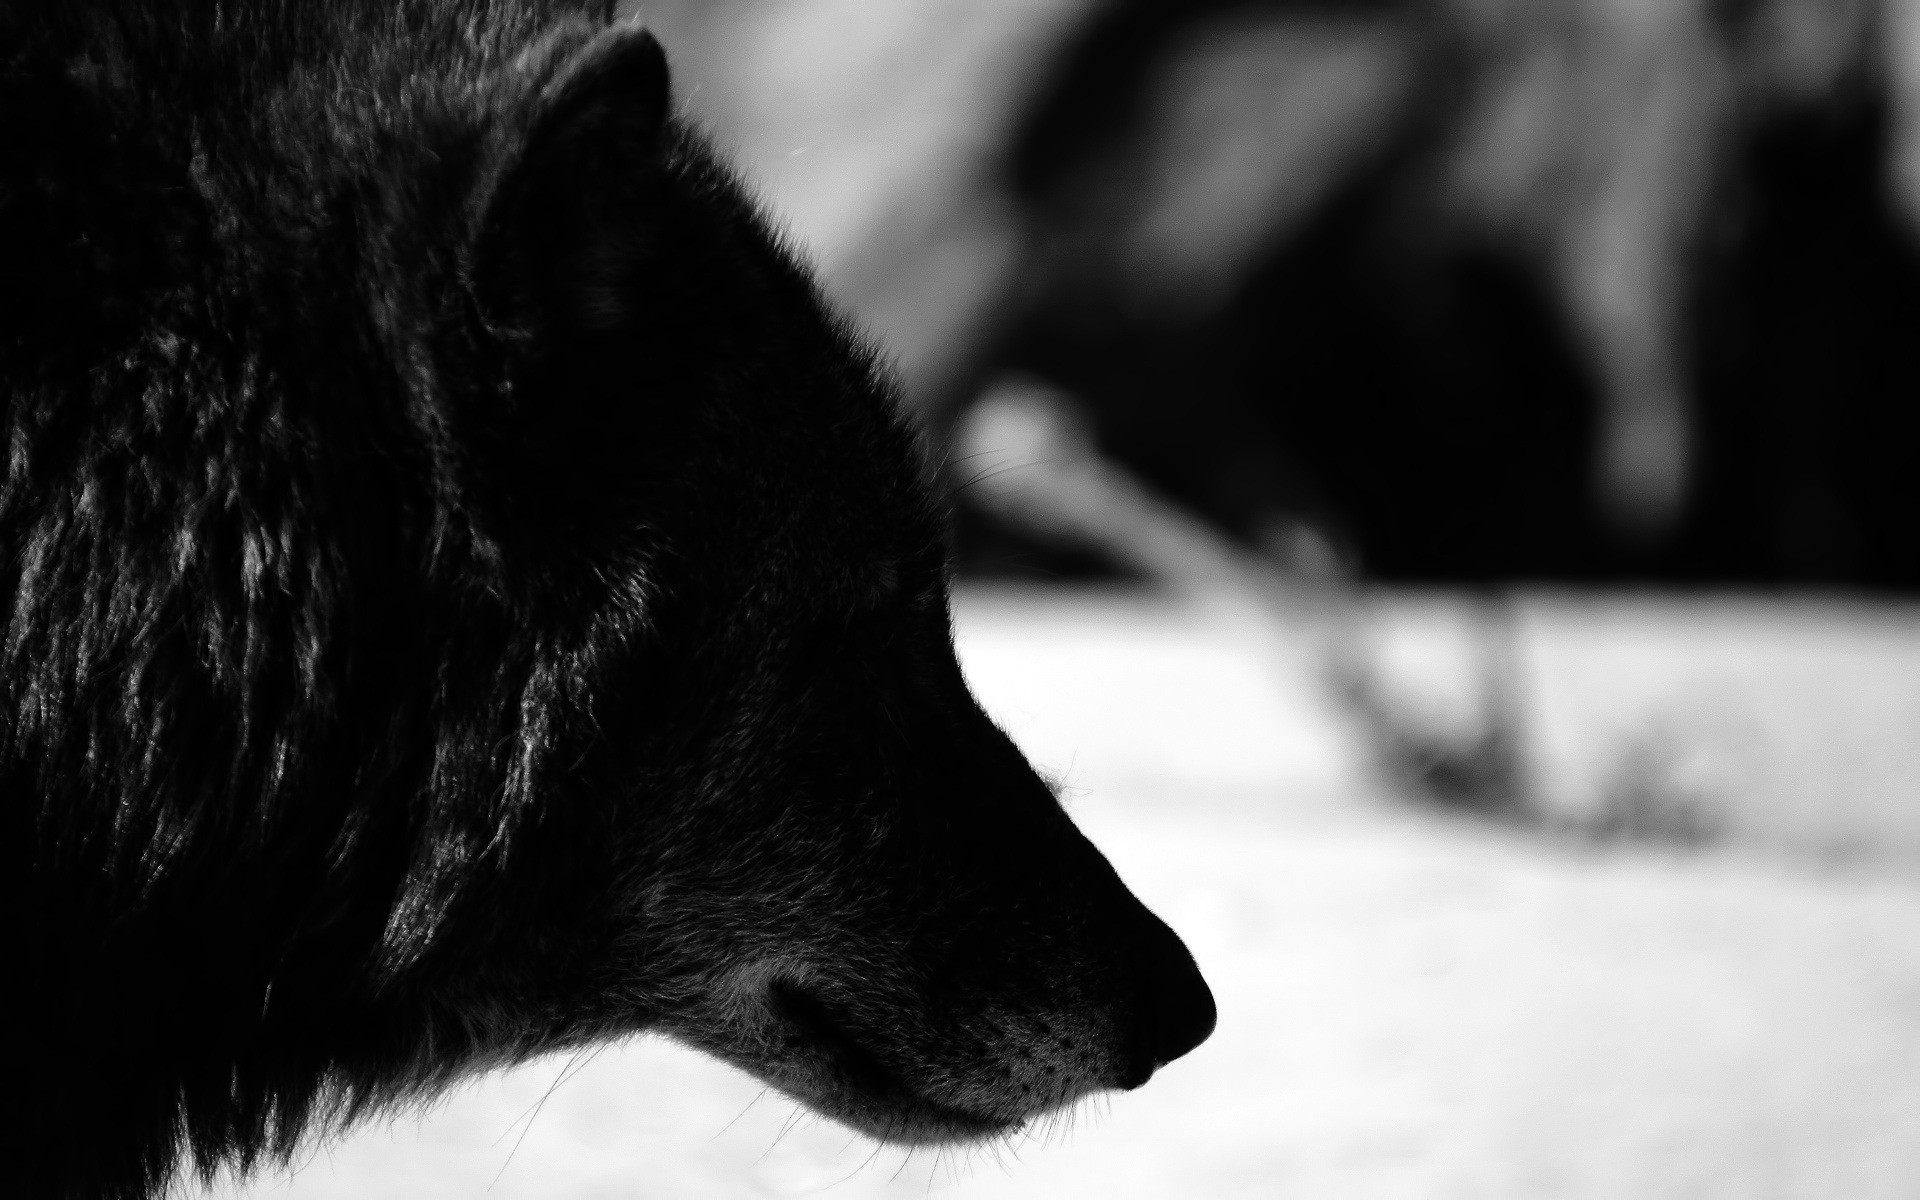 Black Wolf Wallpaper 32443